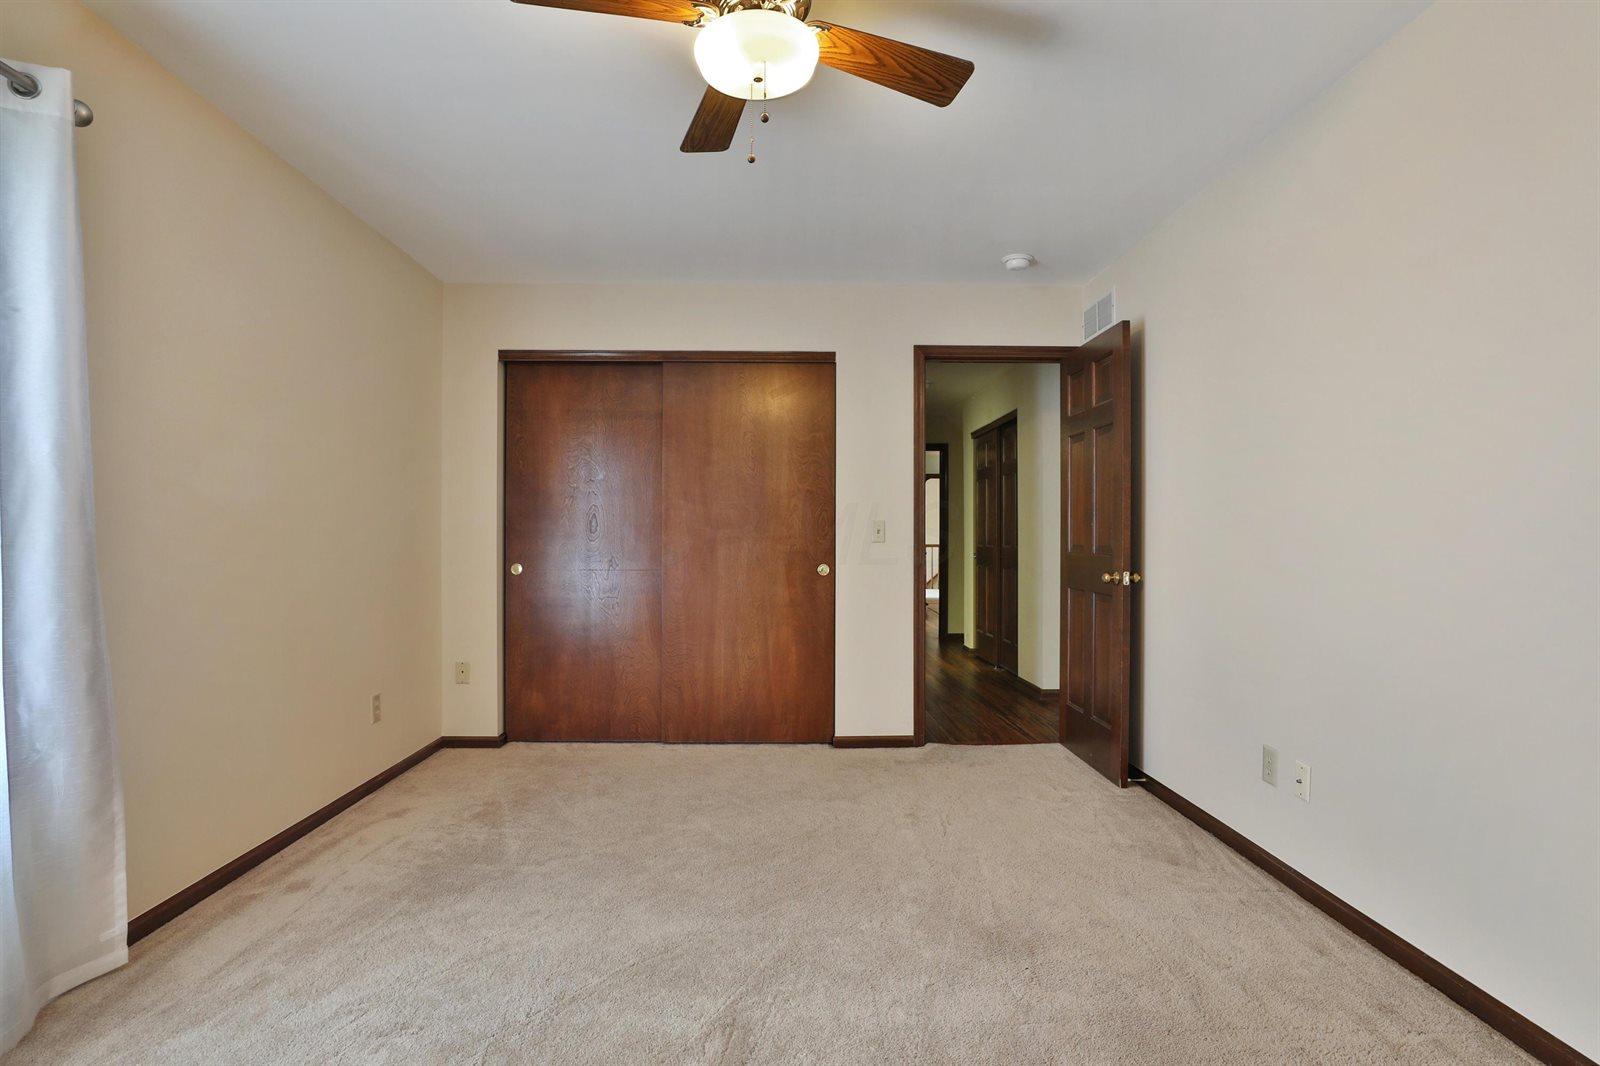 6916 Ravine Circle, Worthington, OH 43085